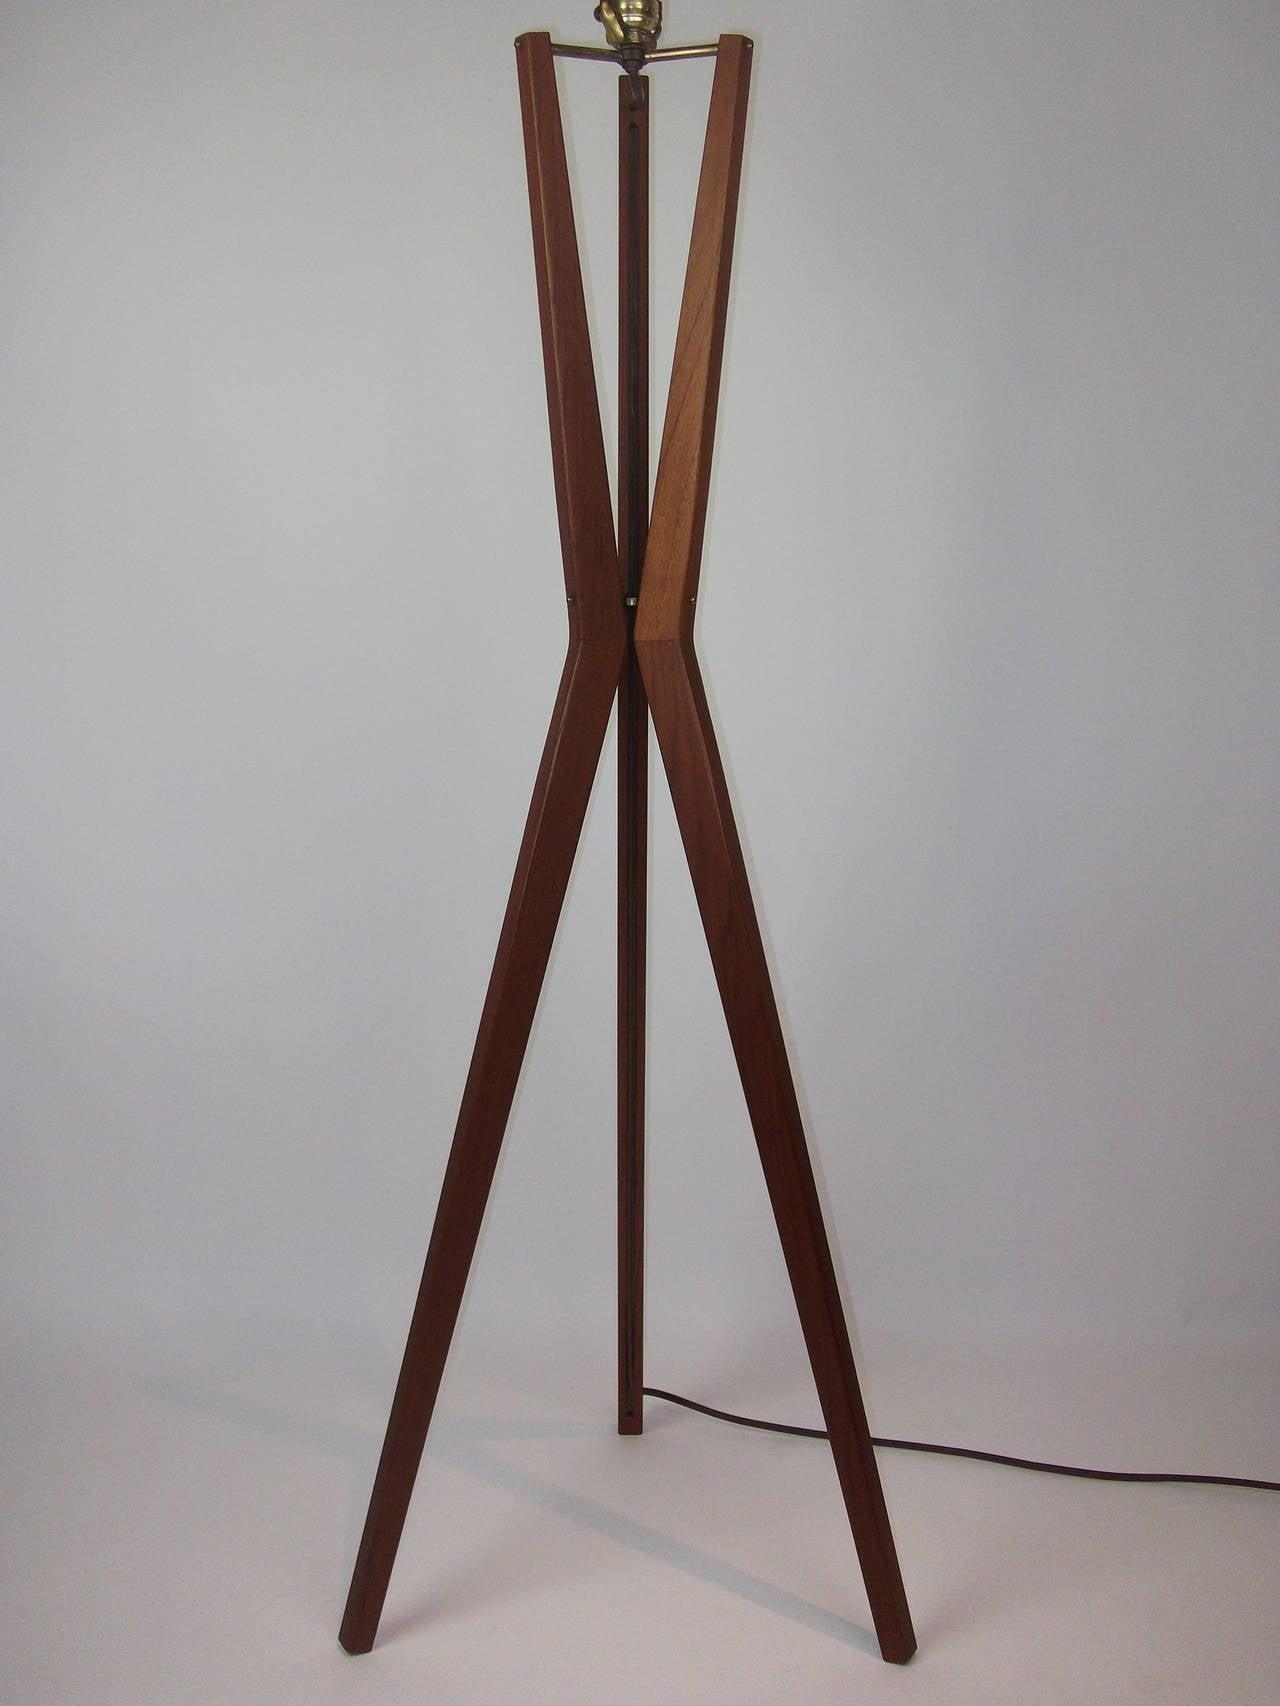 Striking 1960s Danish Modern Three Leg Teak Floor Lamp At 1stdibs